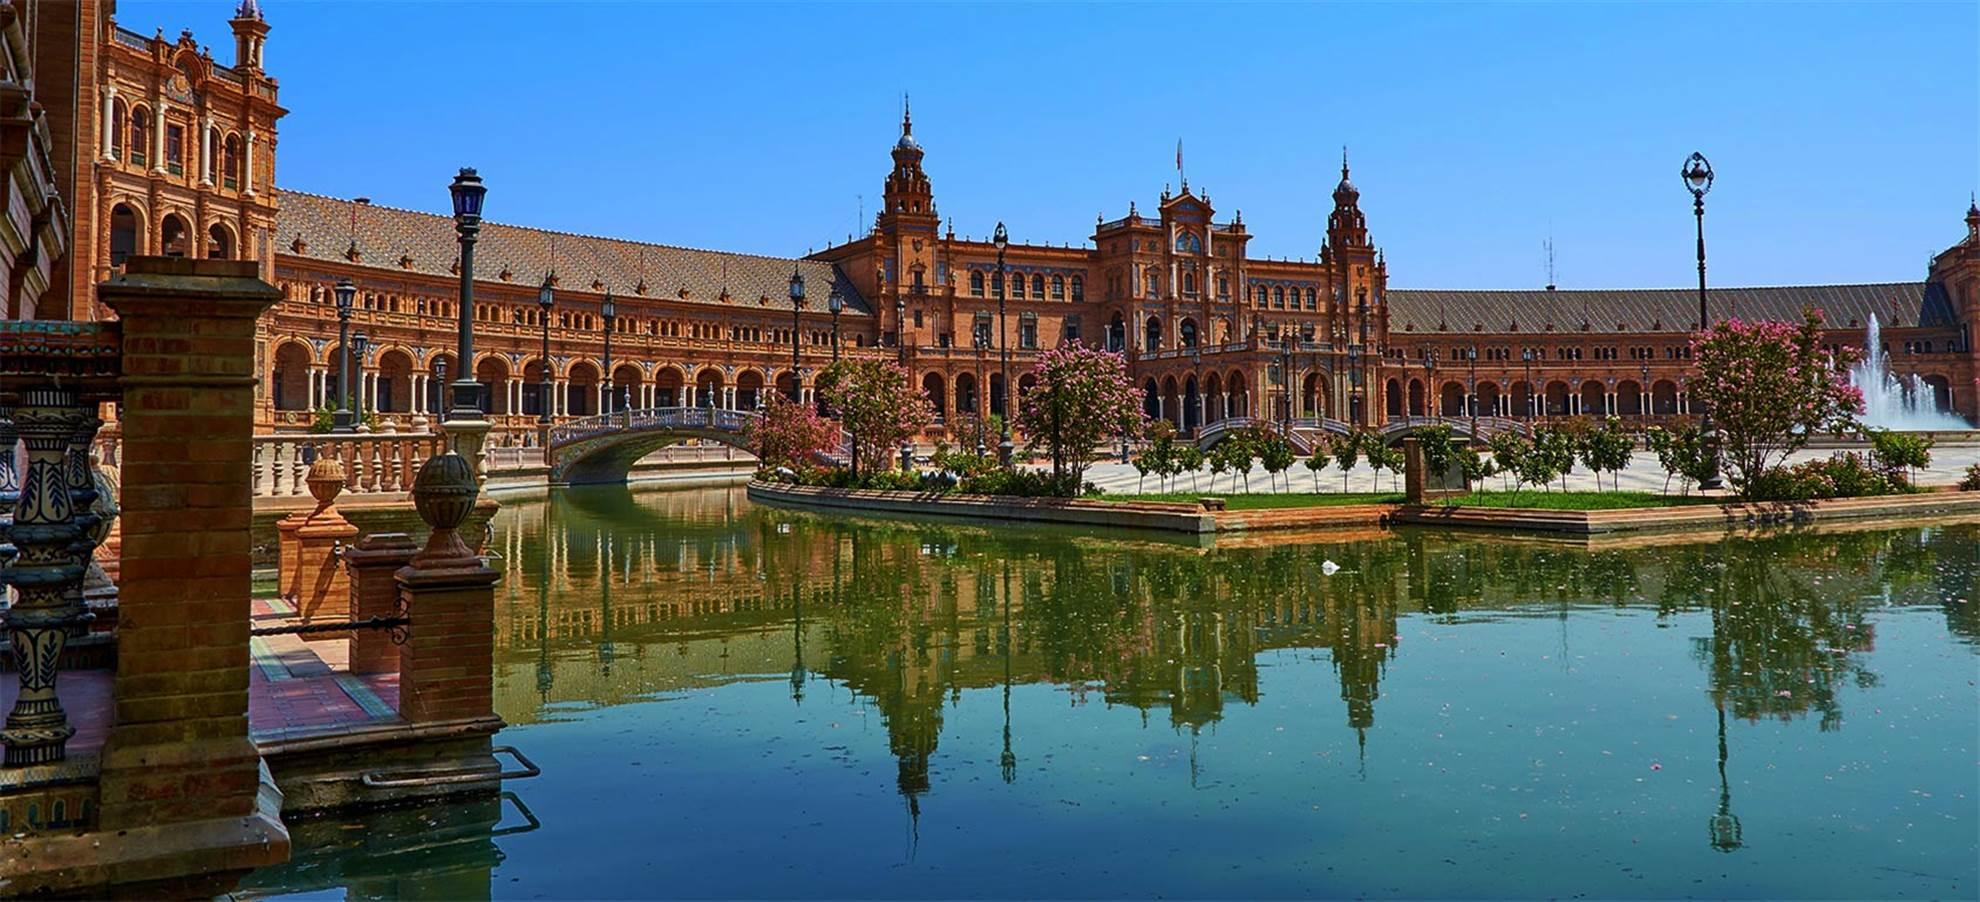 Sevilla fascinerend en monumentaal (SVQFASMO)